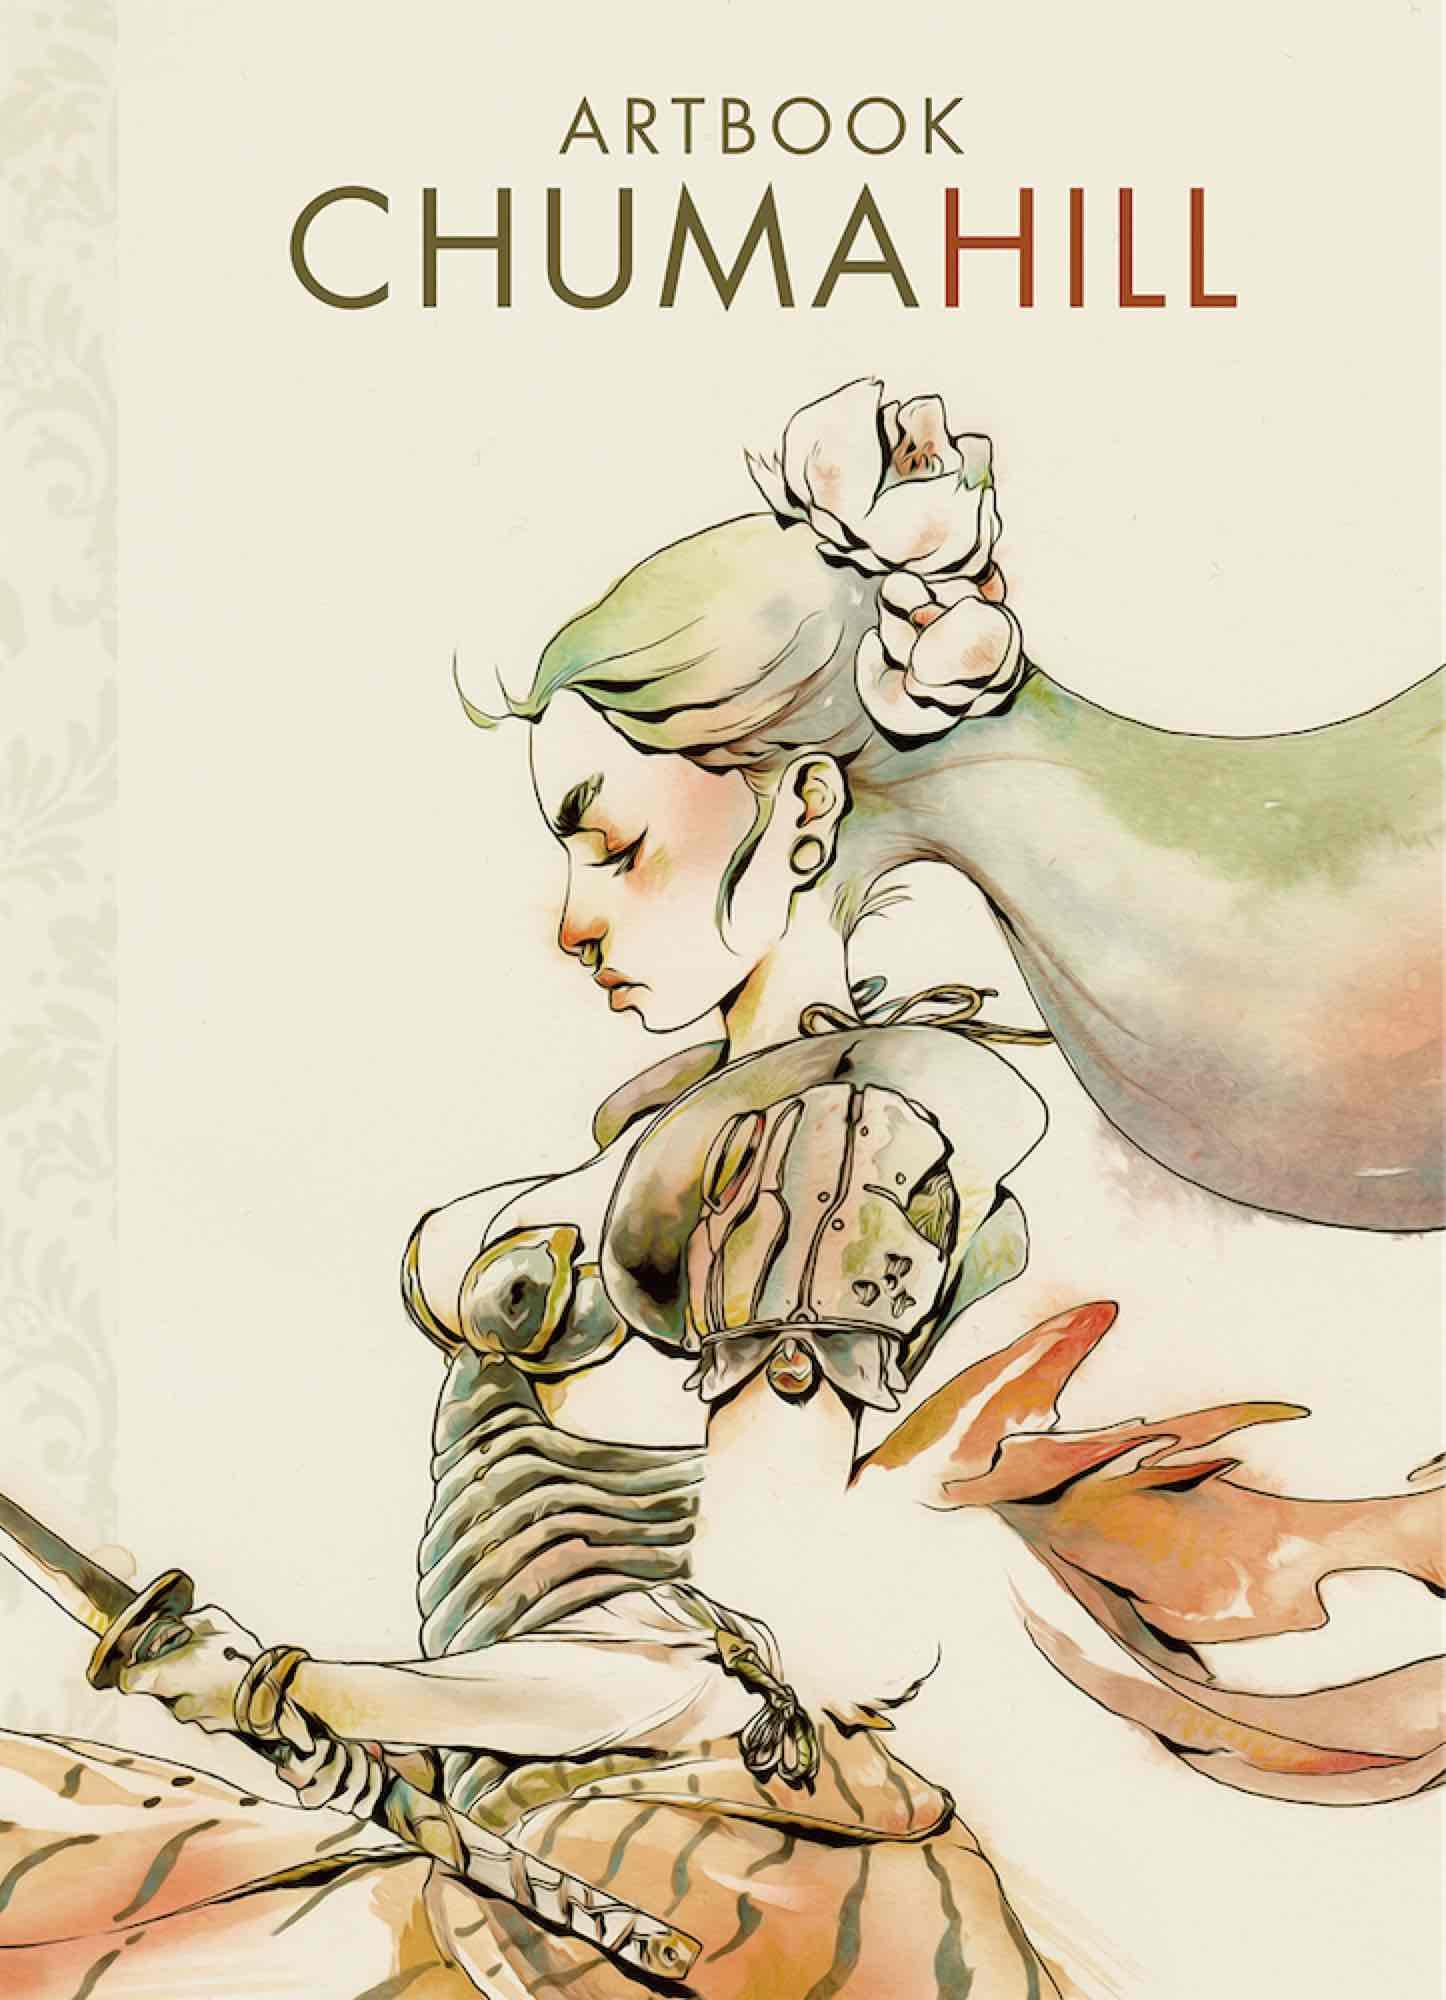 ARTBOOK CHUMAHILL